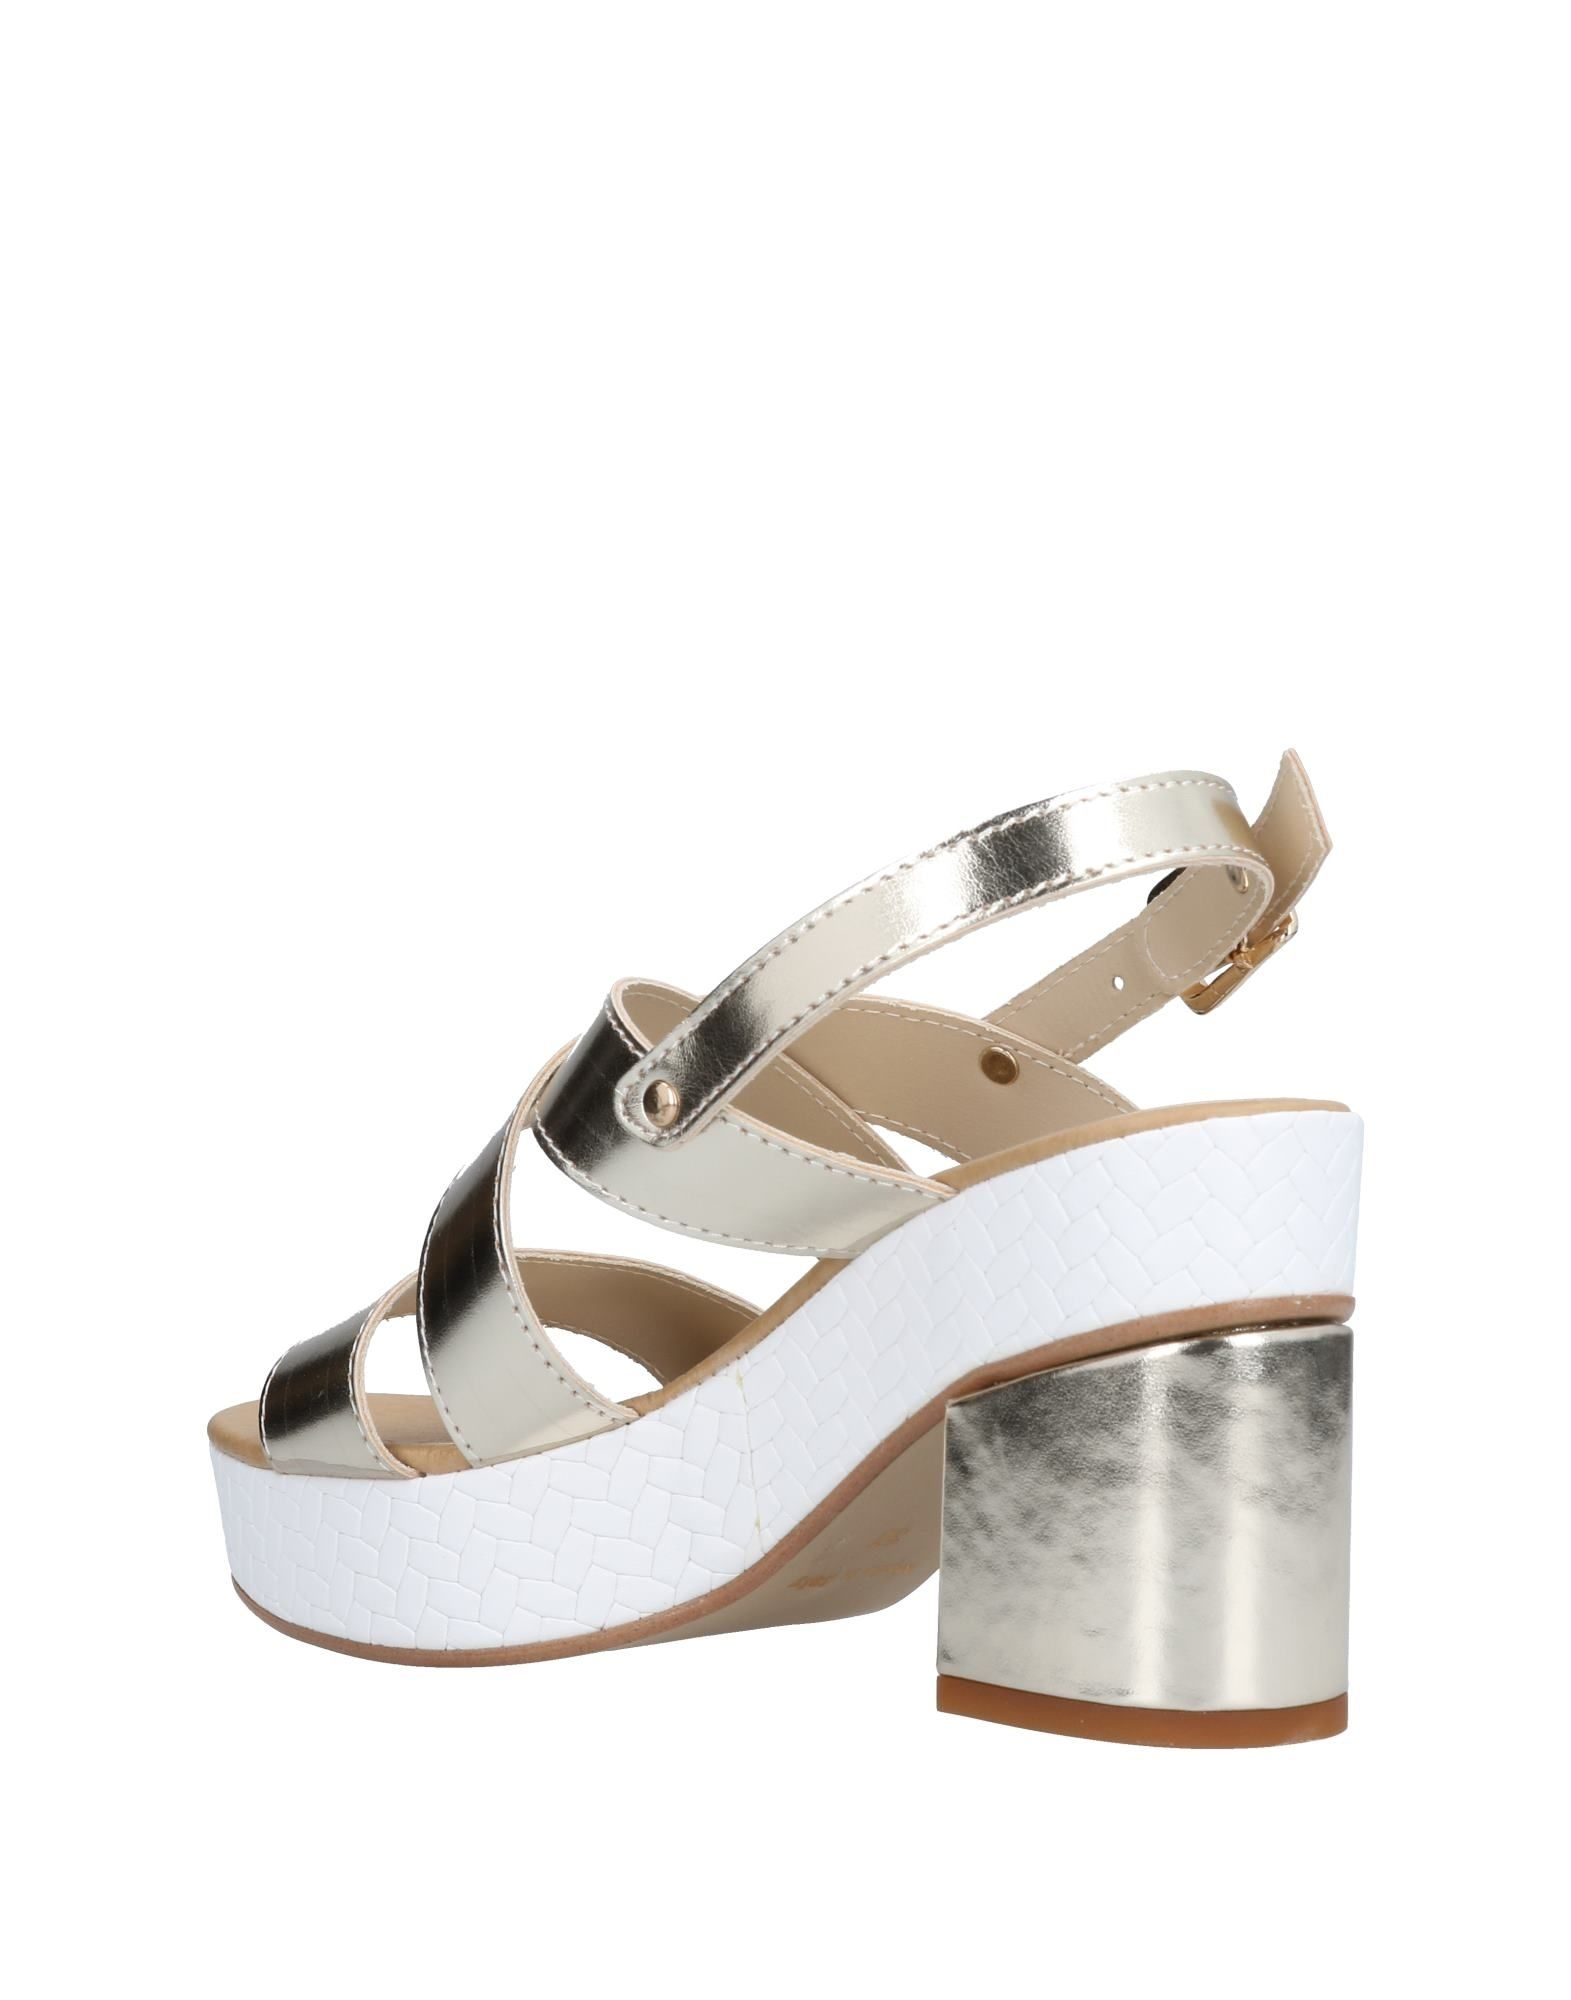 Sara Sandalen Damen  11499729KD Gute Qualität beliebte Schuhe